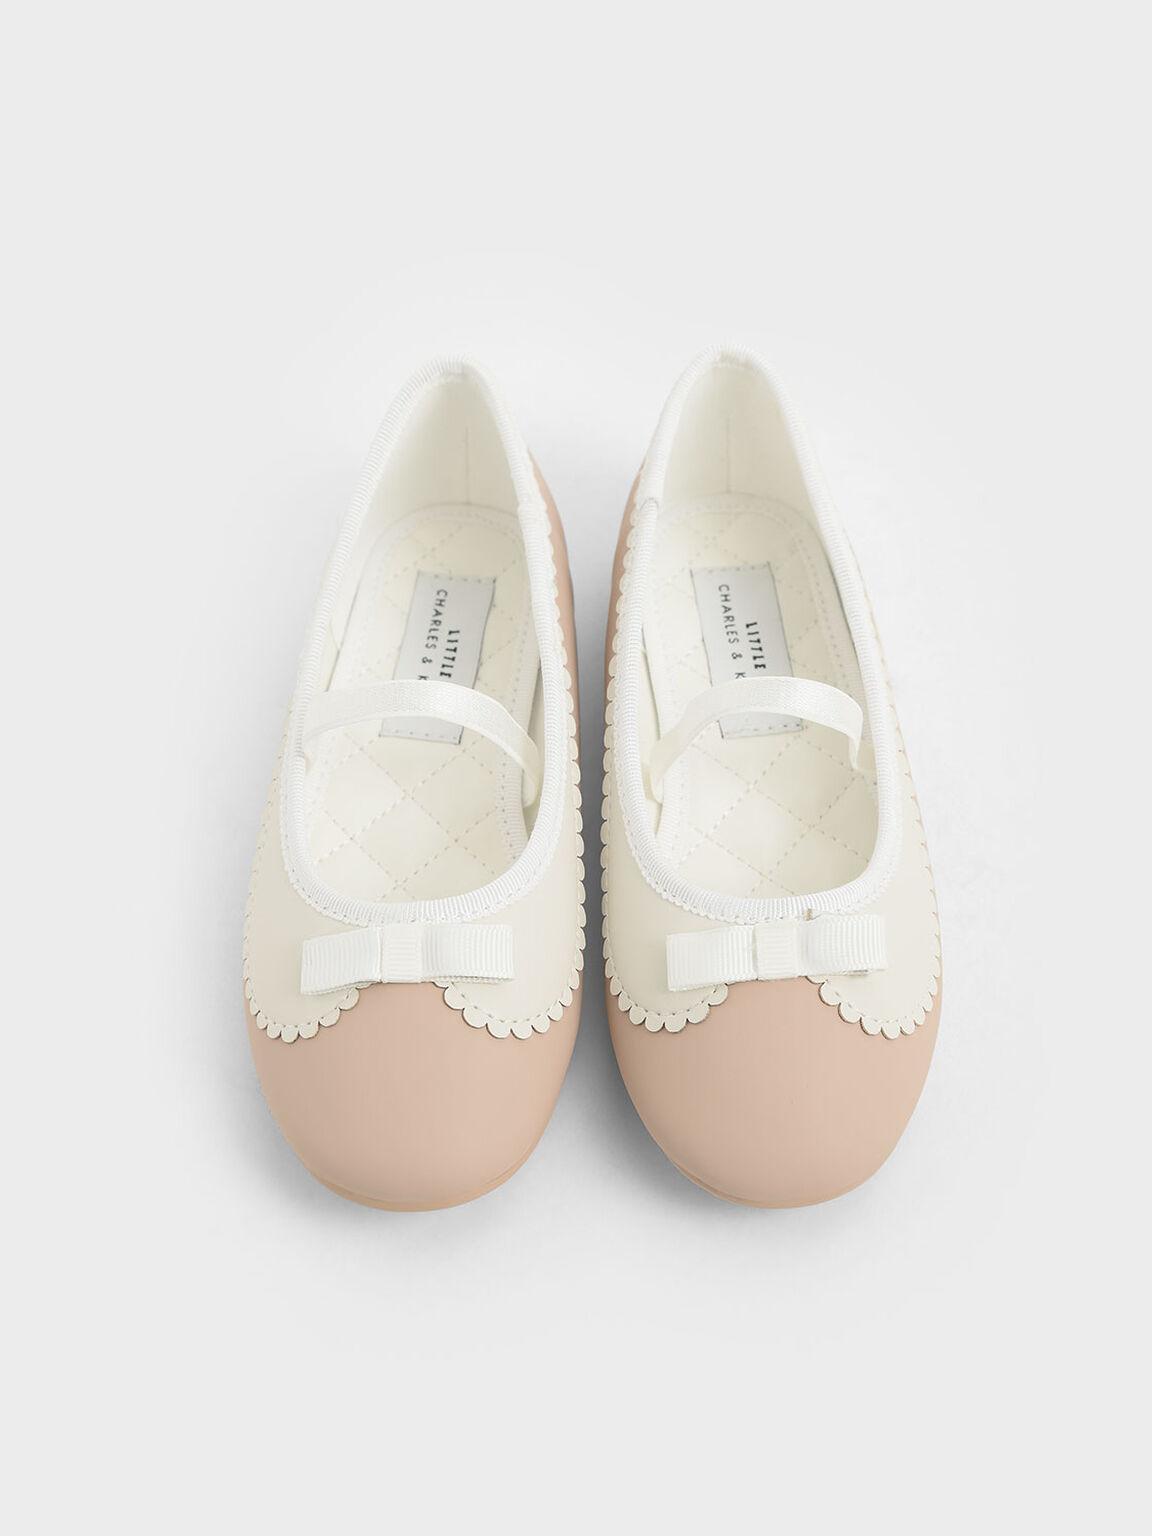 Girls' Scallop Trim Ballerina Flats, Pink, hi-res